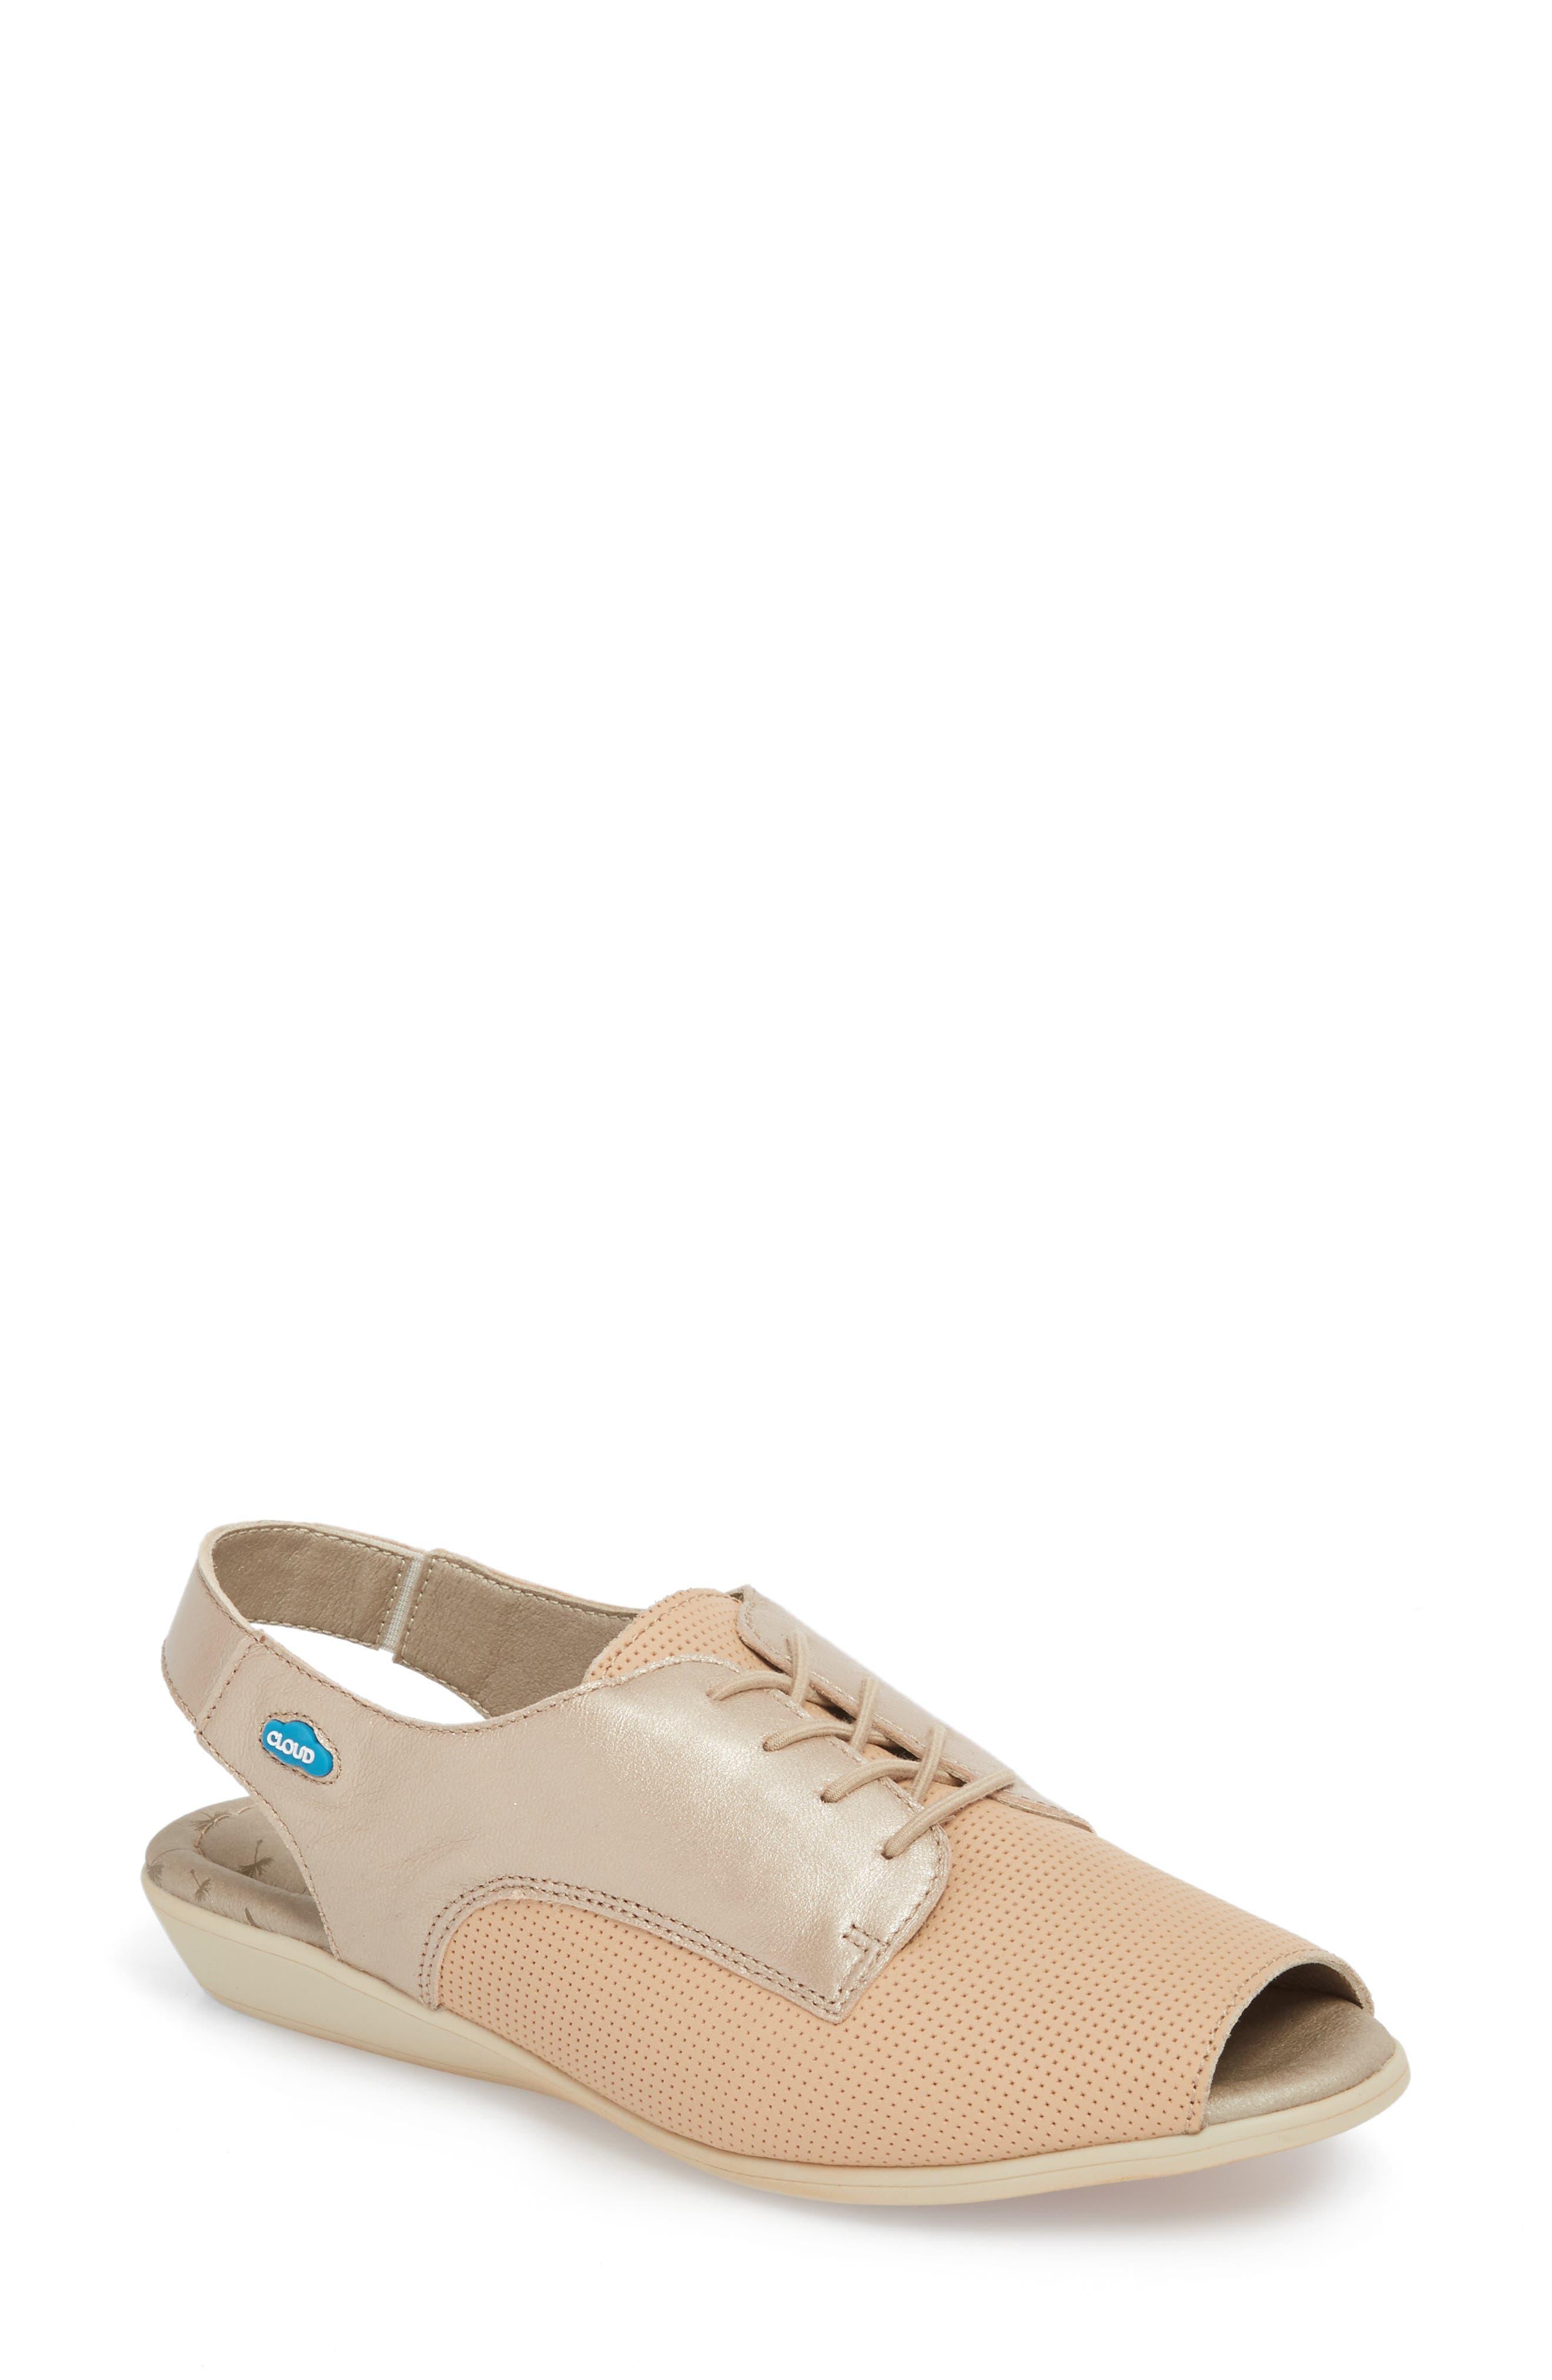 Cleone Slingback Sandal,                             Main thumbnail 1, color,                             Puima Sabbia Leather